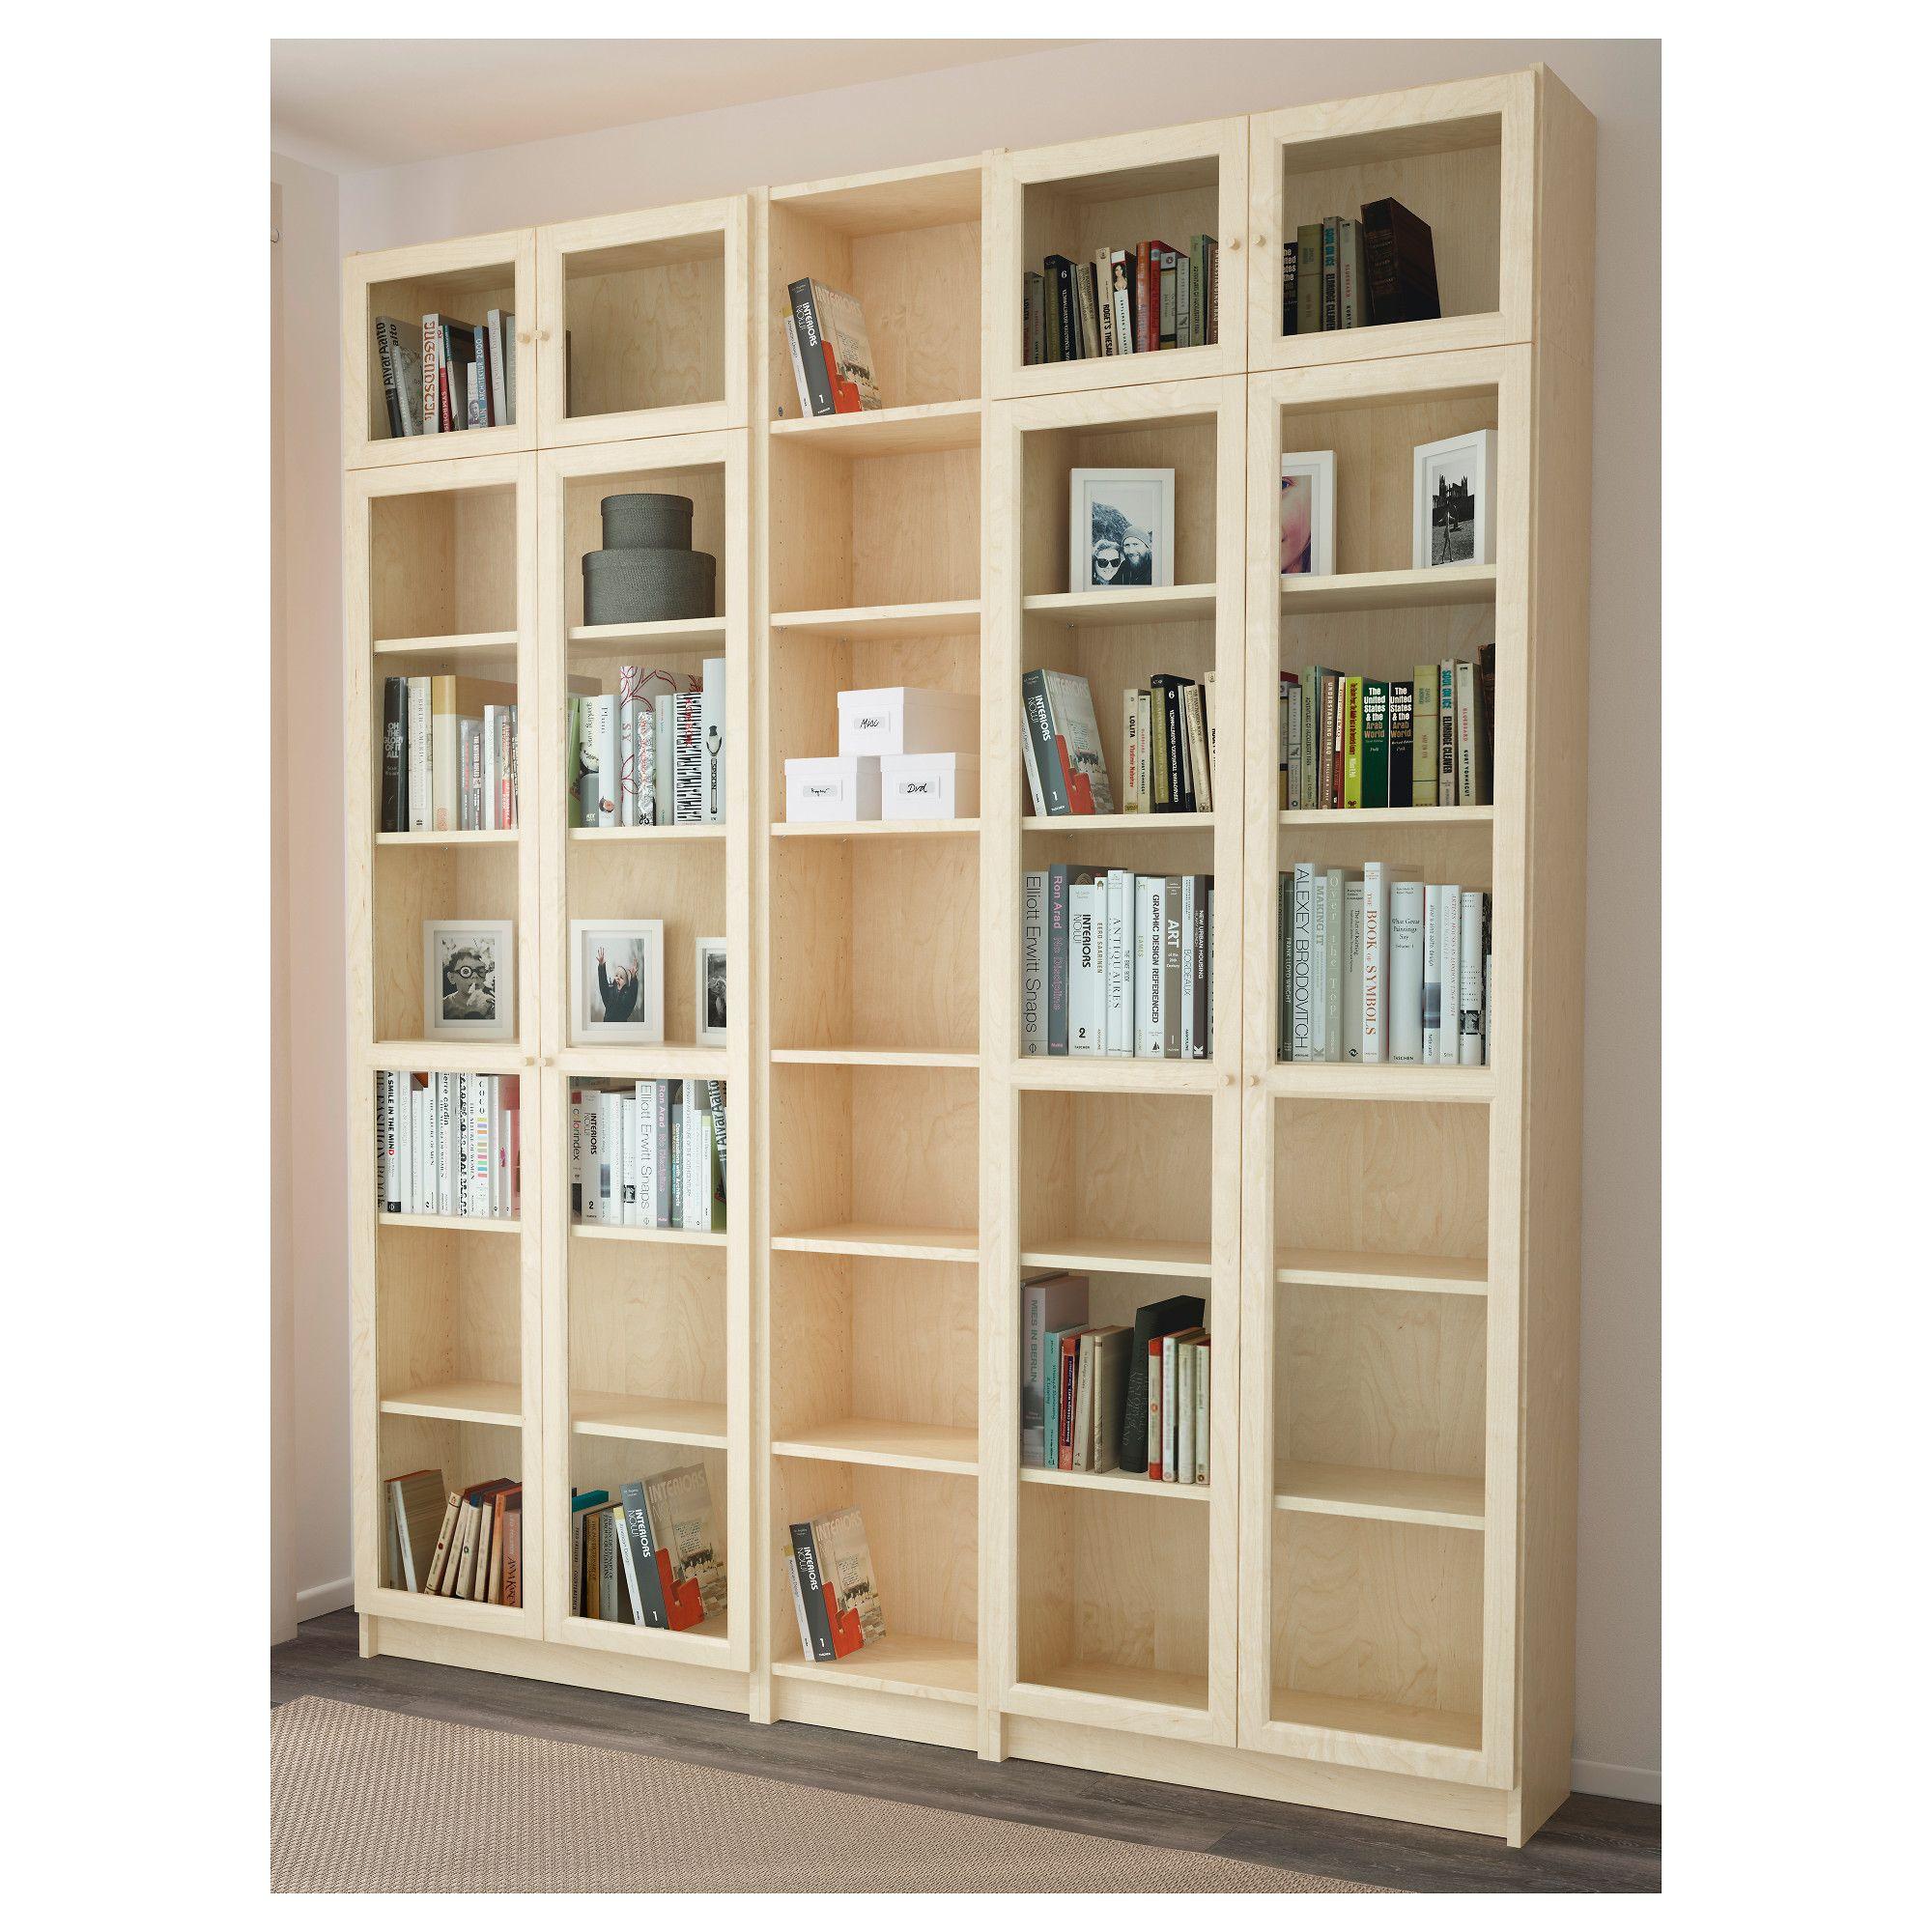 bookcase billy oxberg birch veneer book shelves ikea bookcase rh pinterest com